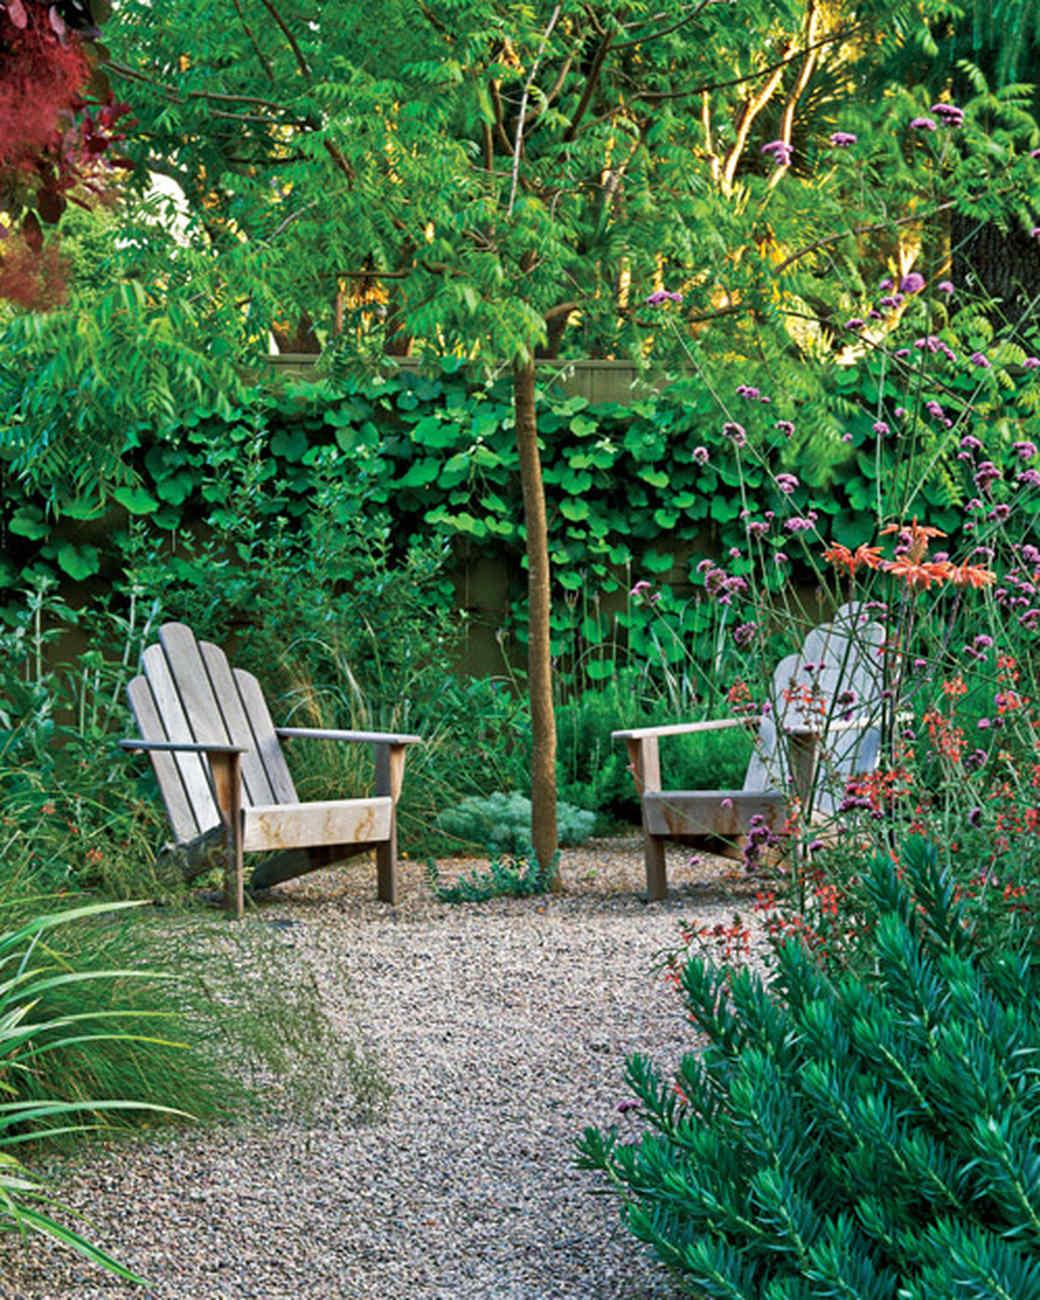 mla10490_0809_vought_garden4.jpg